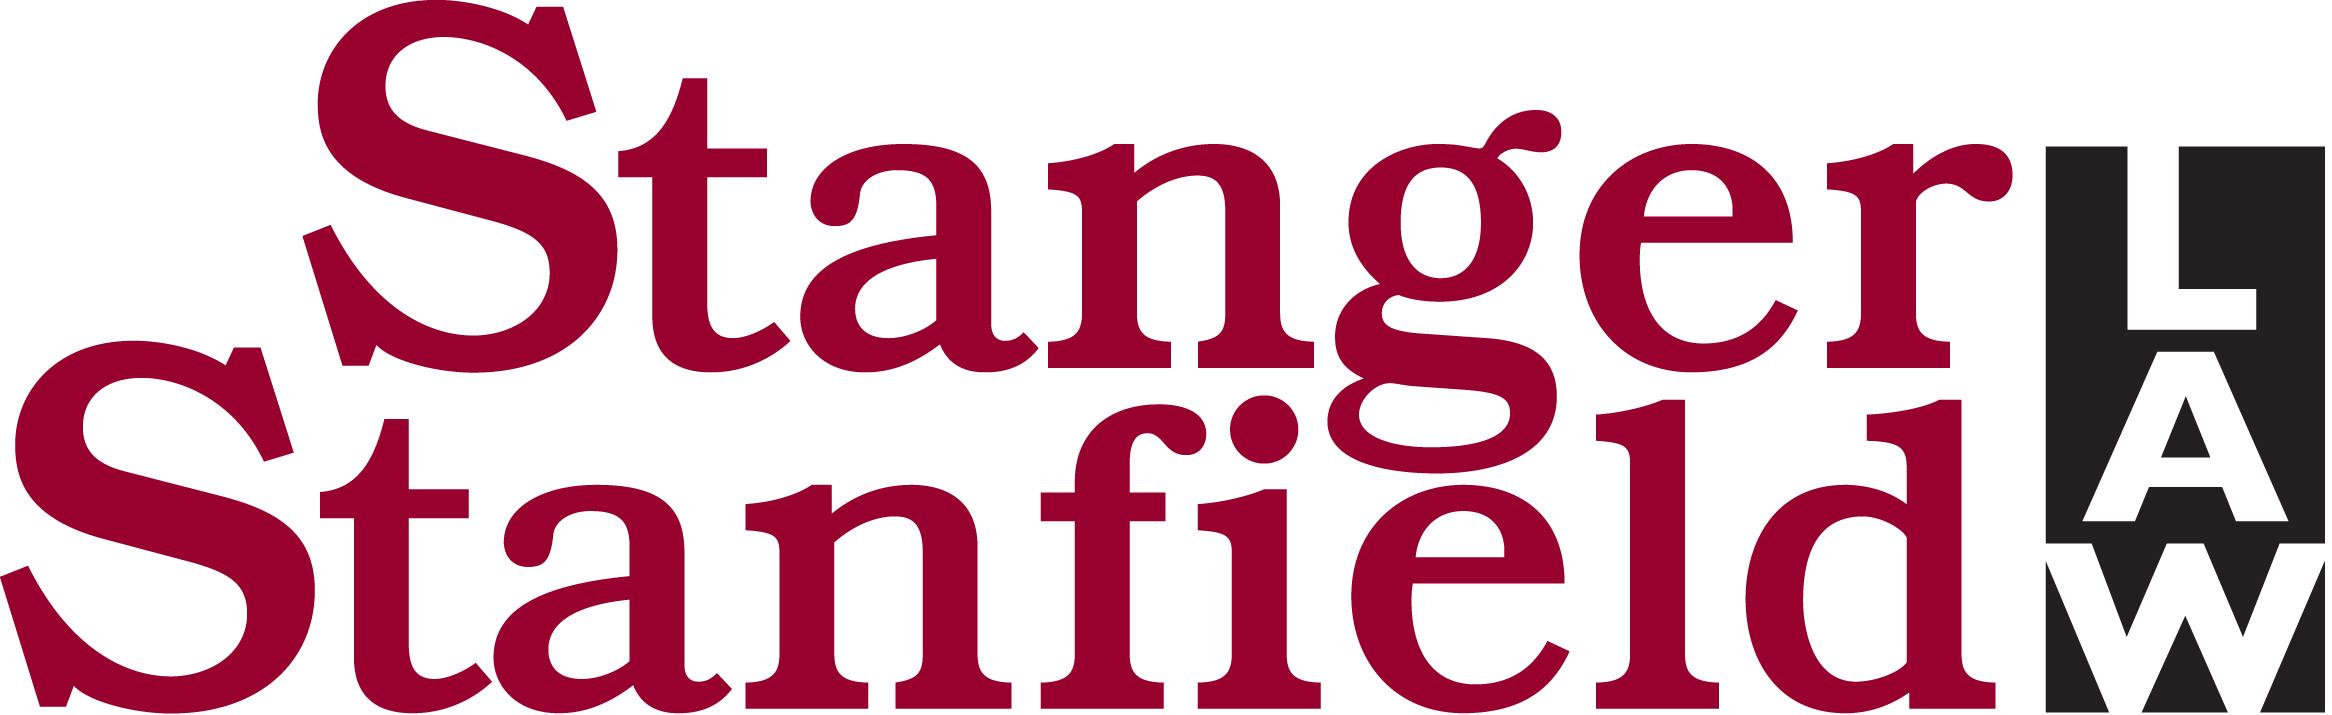 Stanger Stanfield Law, LLC